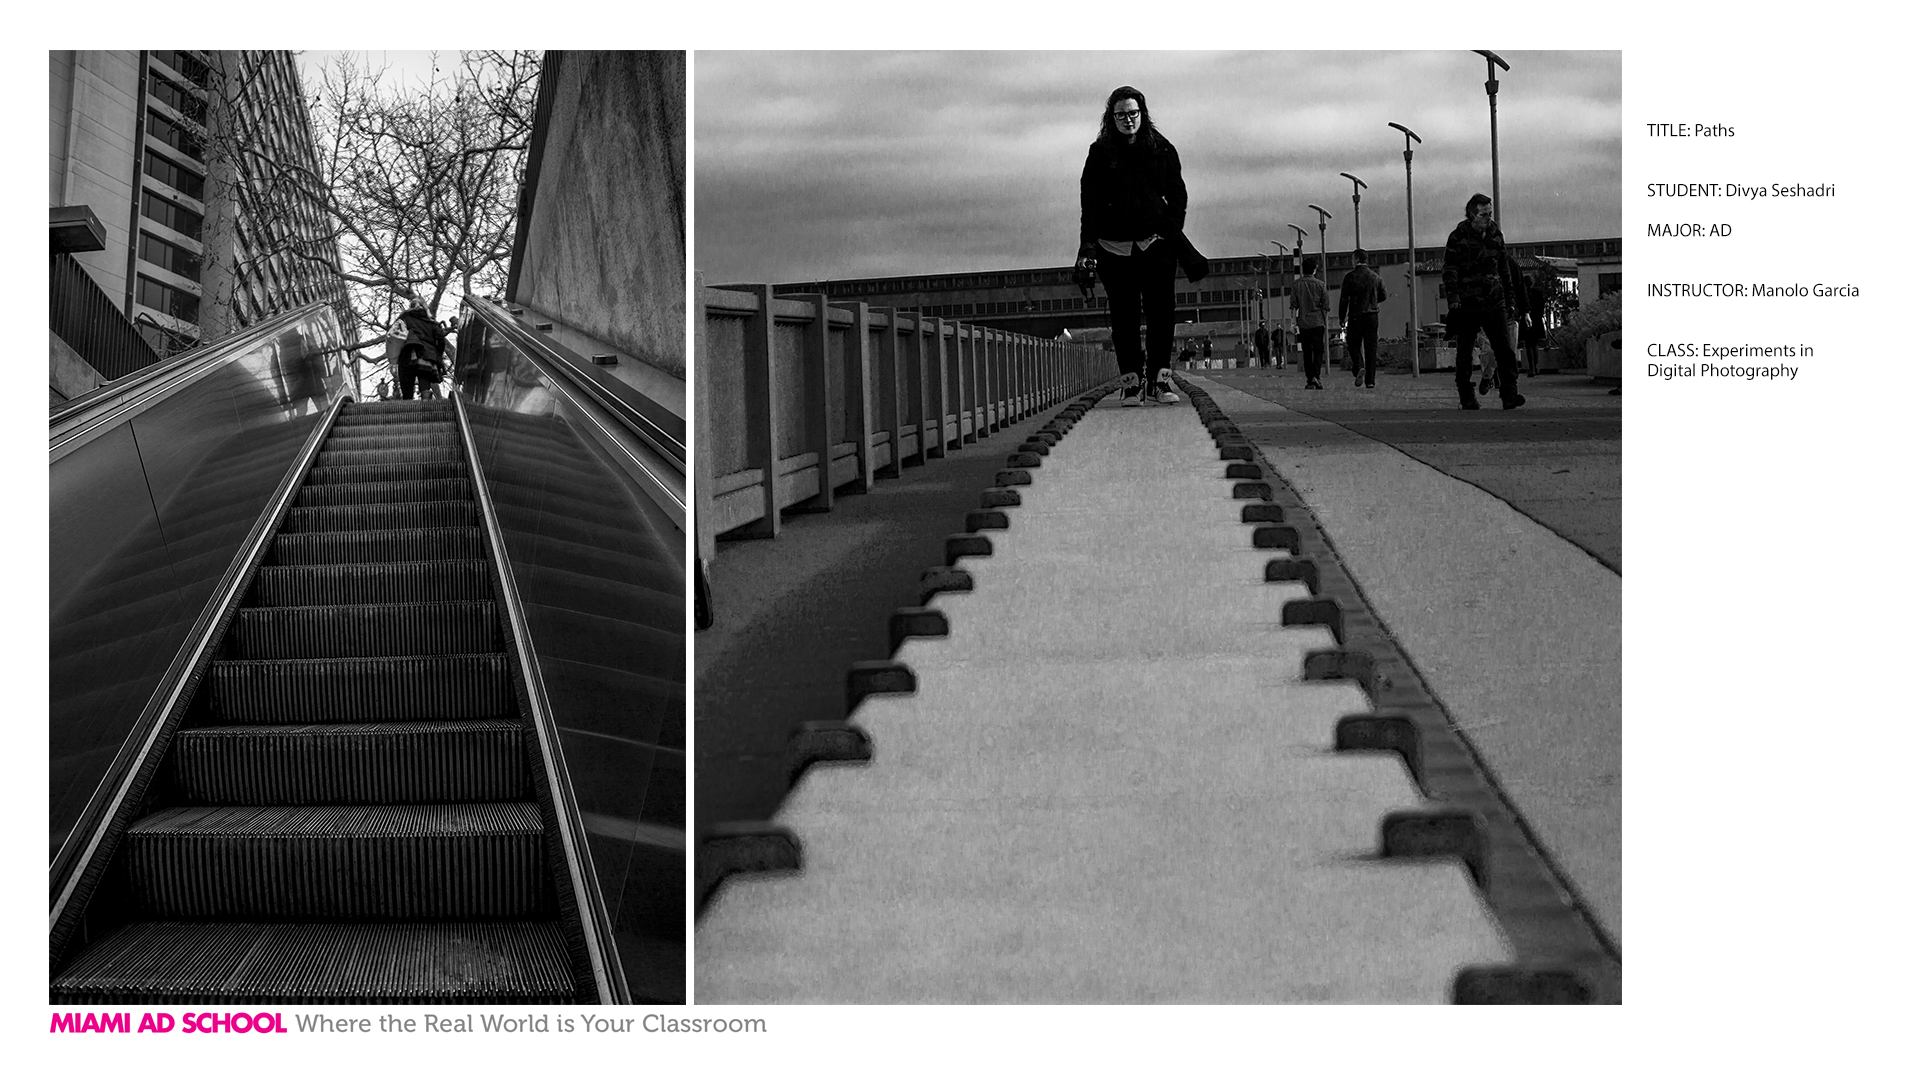 Divya_Ferry_Paths.jpg